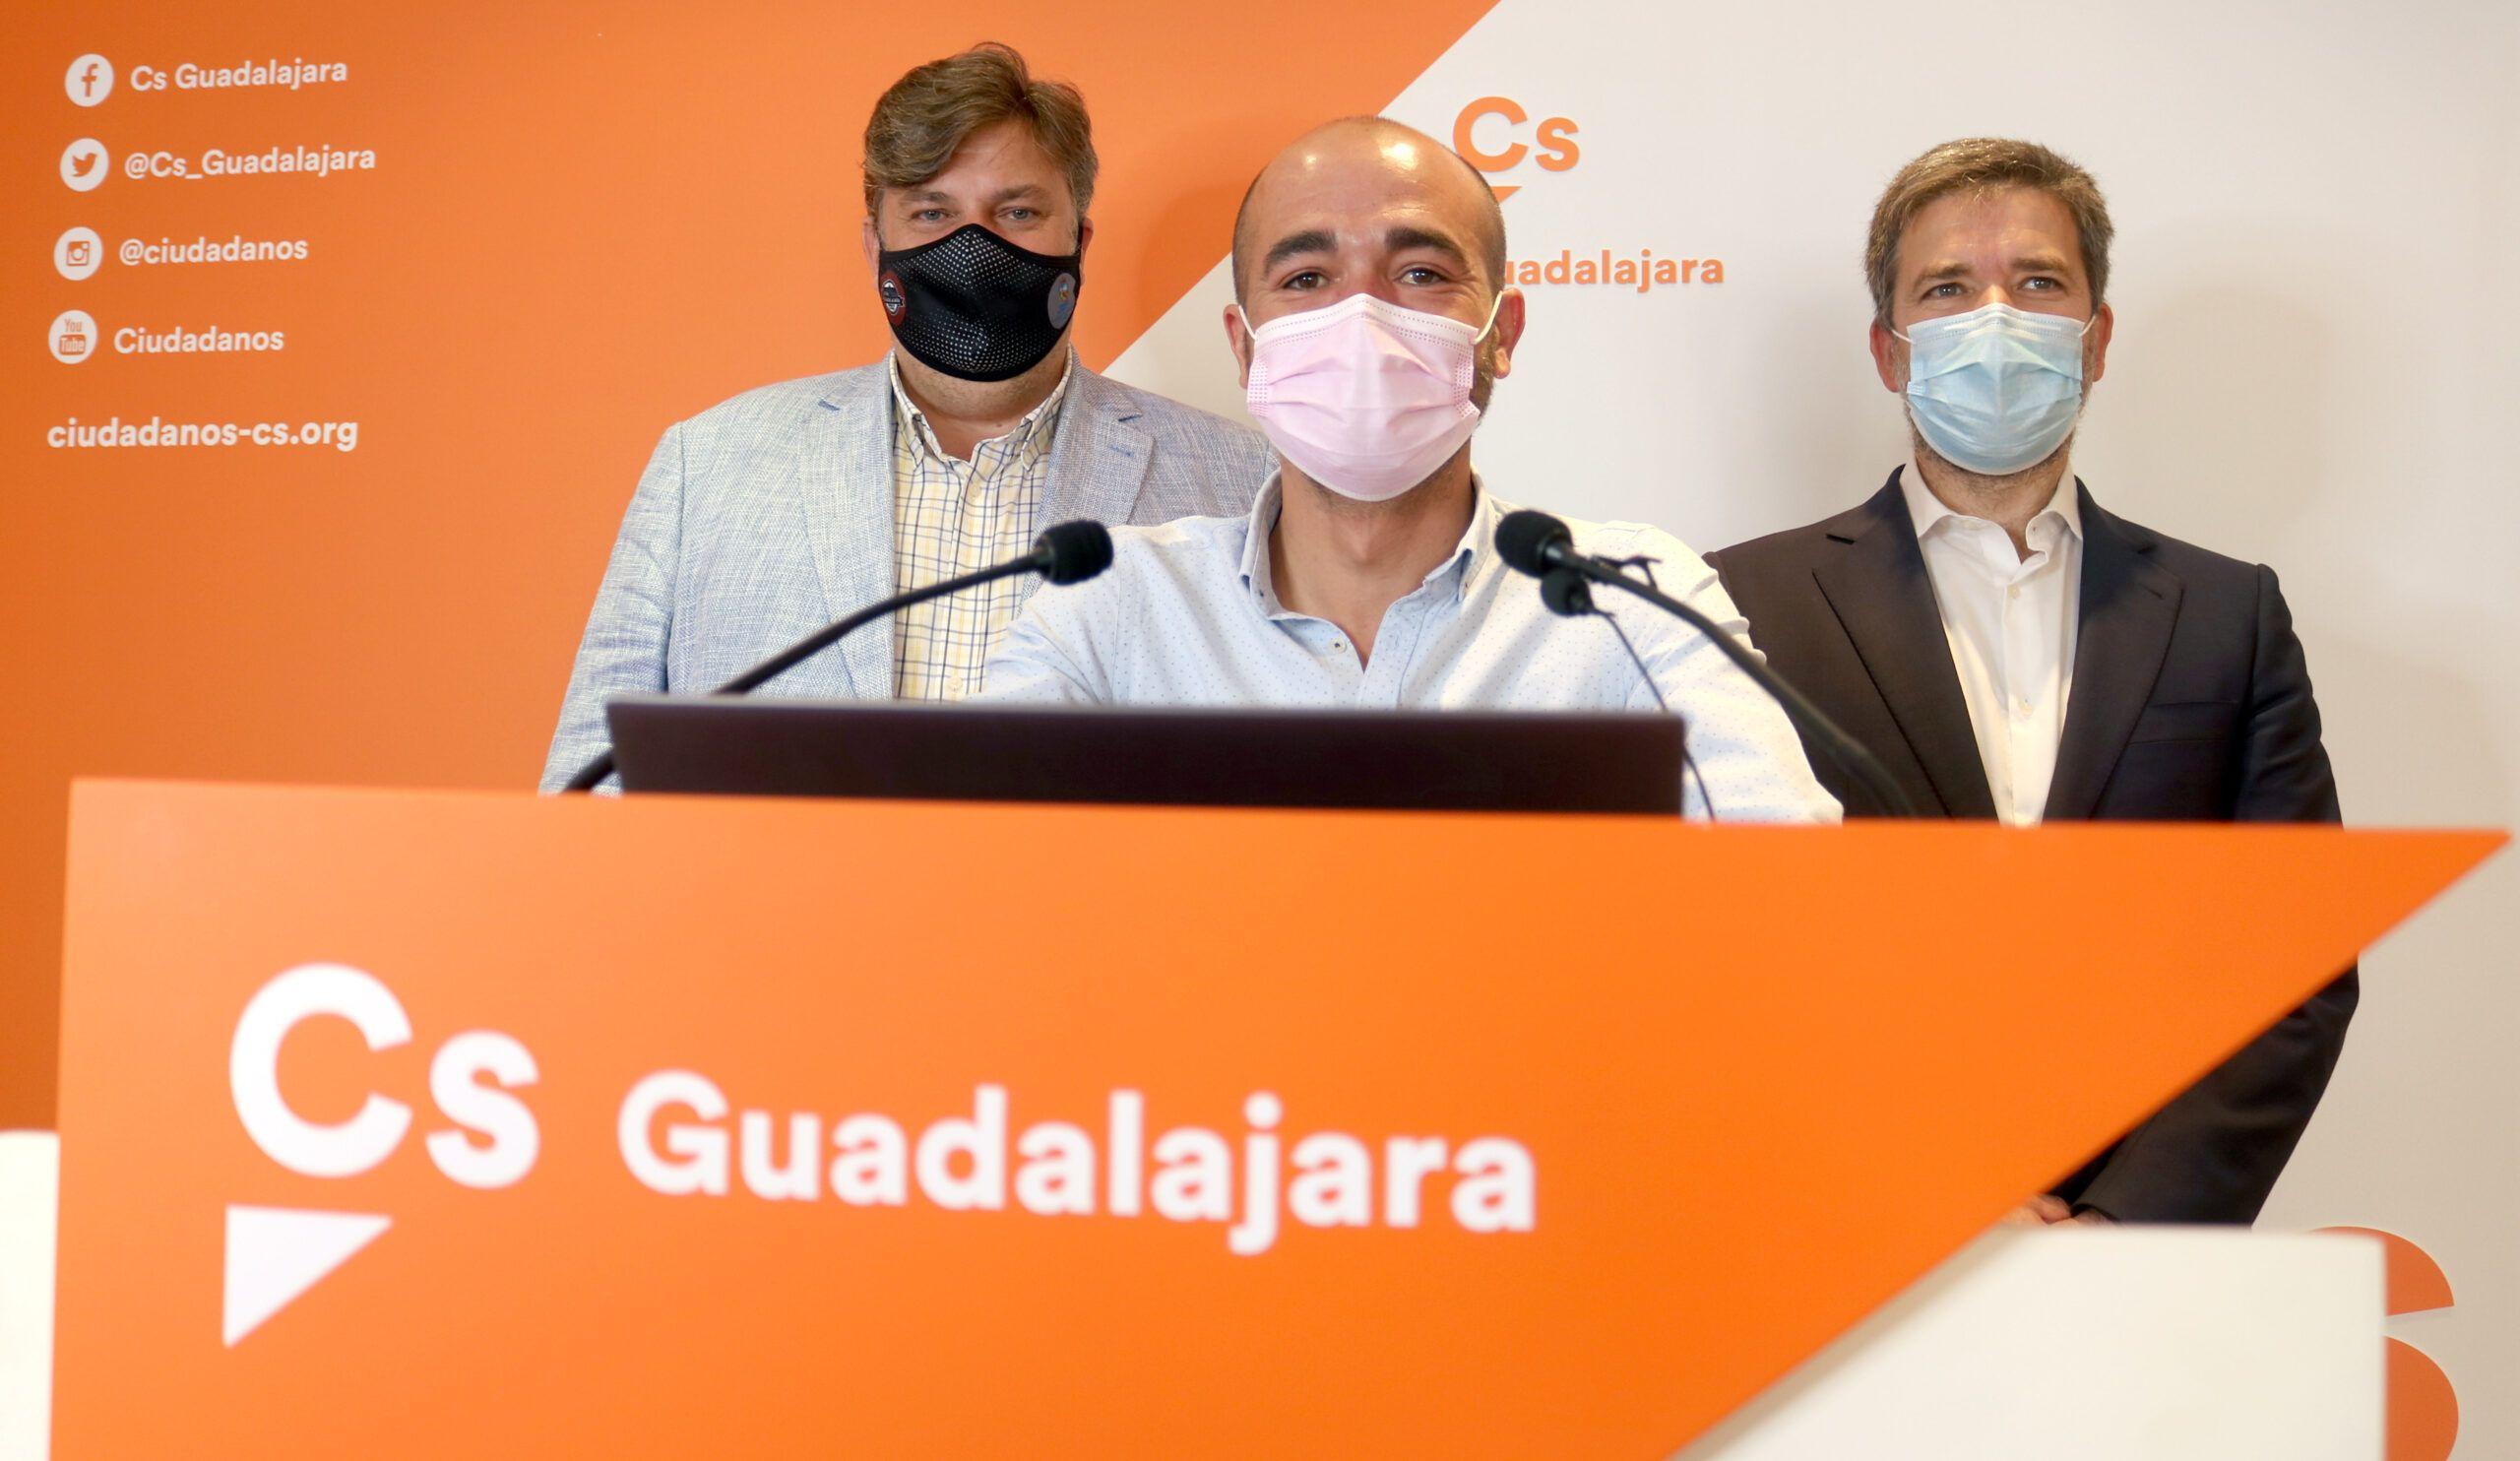 Cs Guadalajara señala que la rebaja del IVA de la luz de Sánchez es un